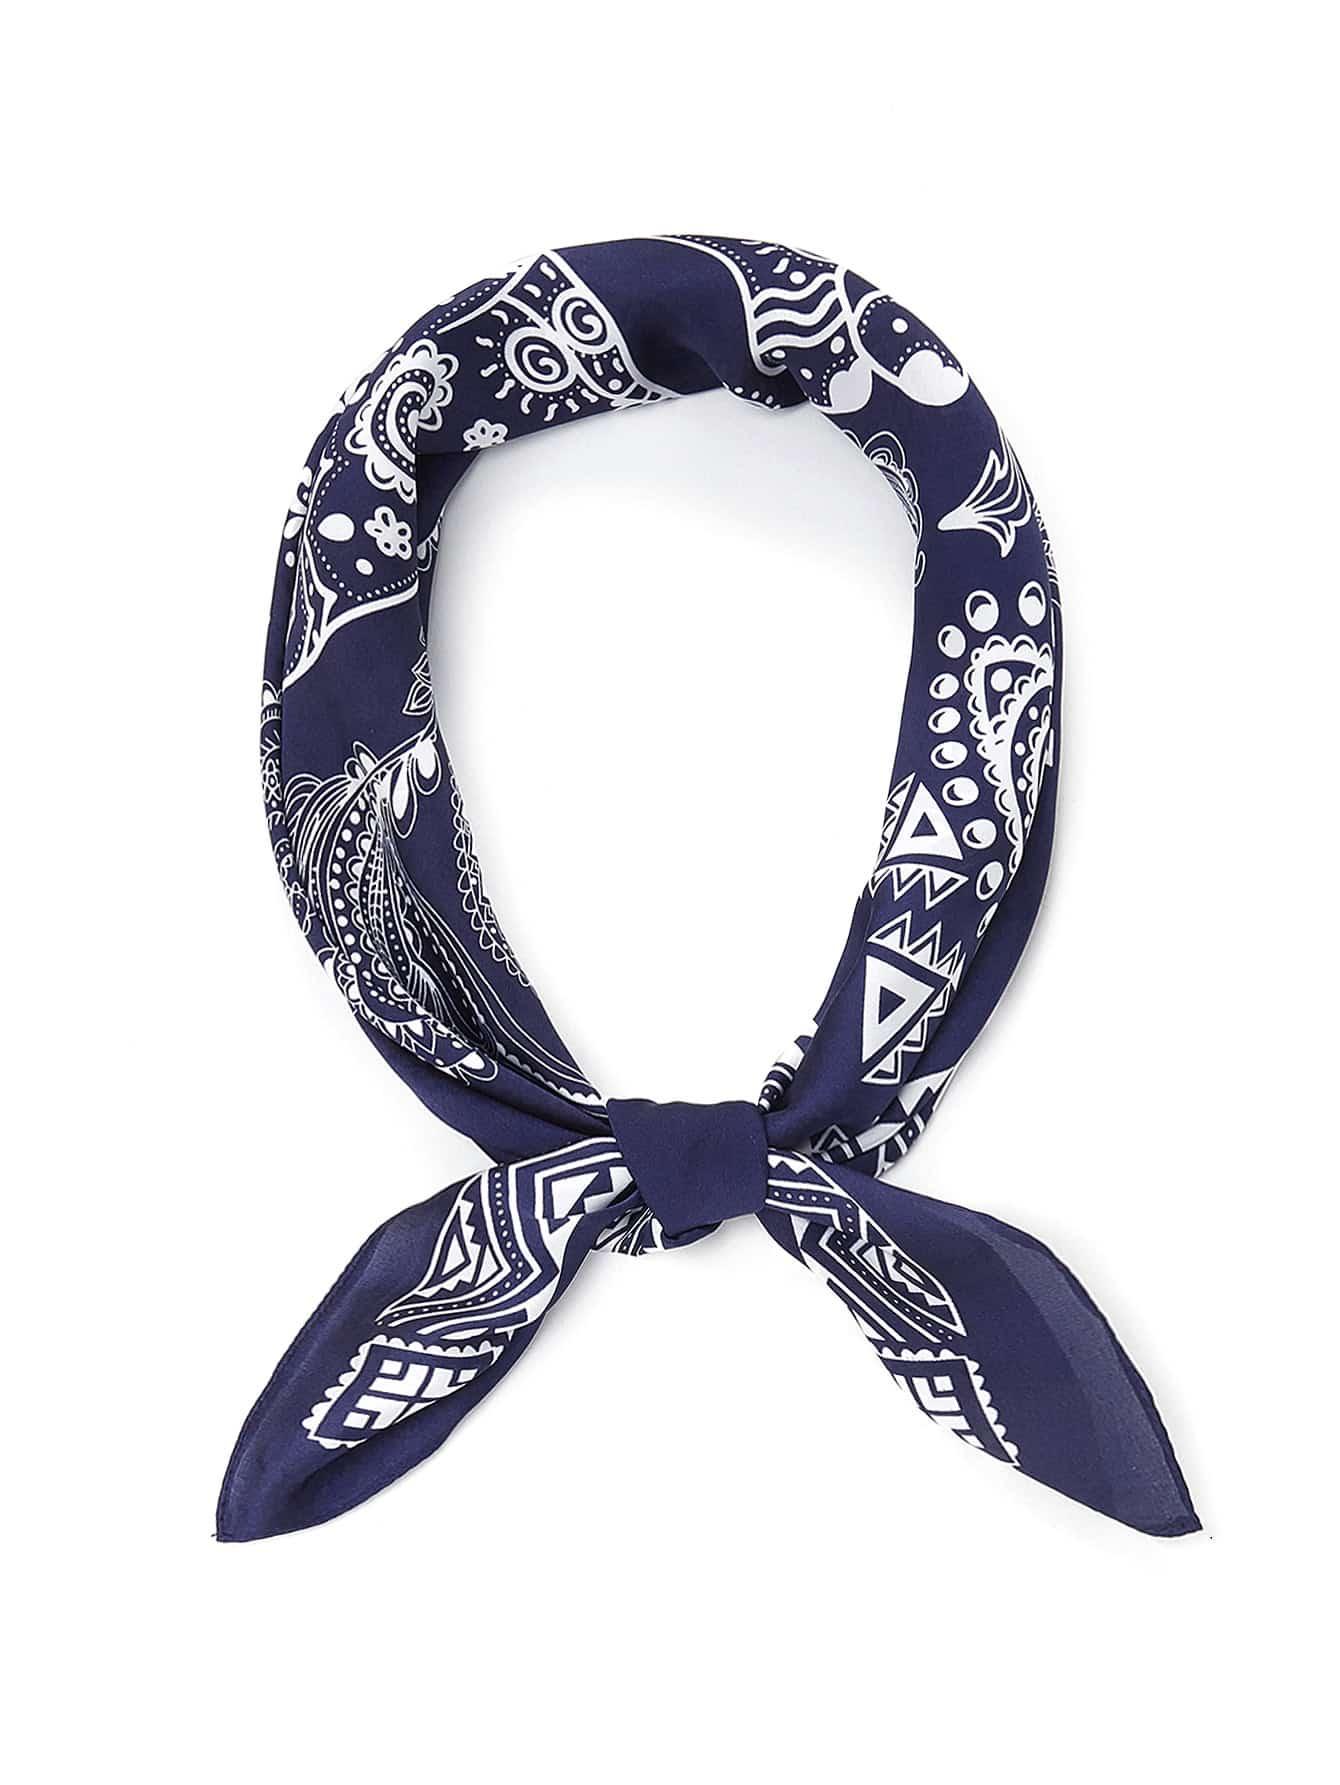 Mixed Print Bandana Scarf color block geometric bandana scarf